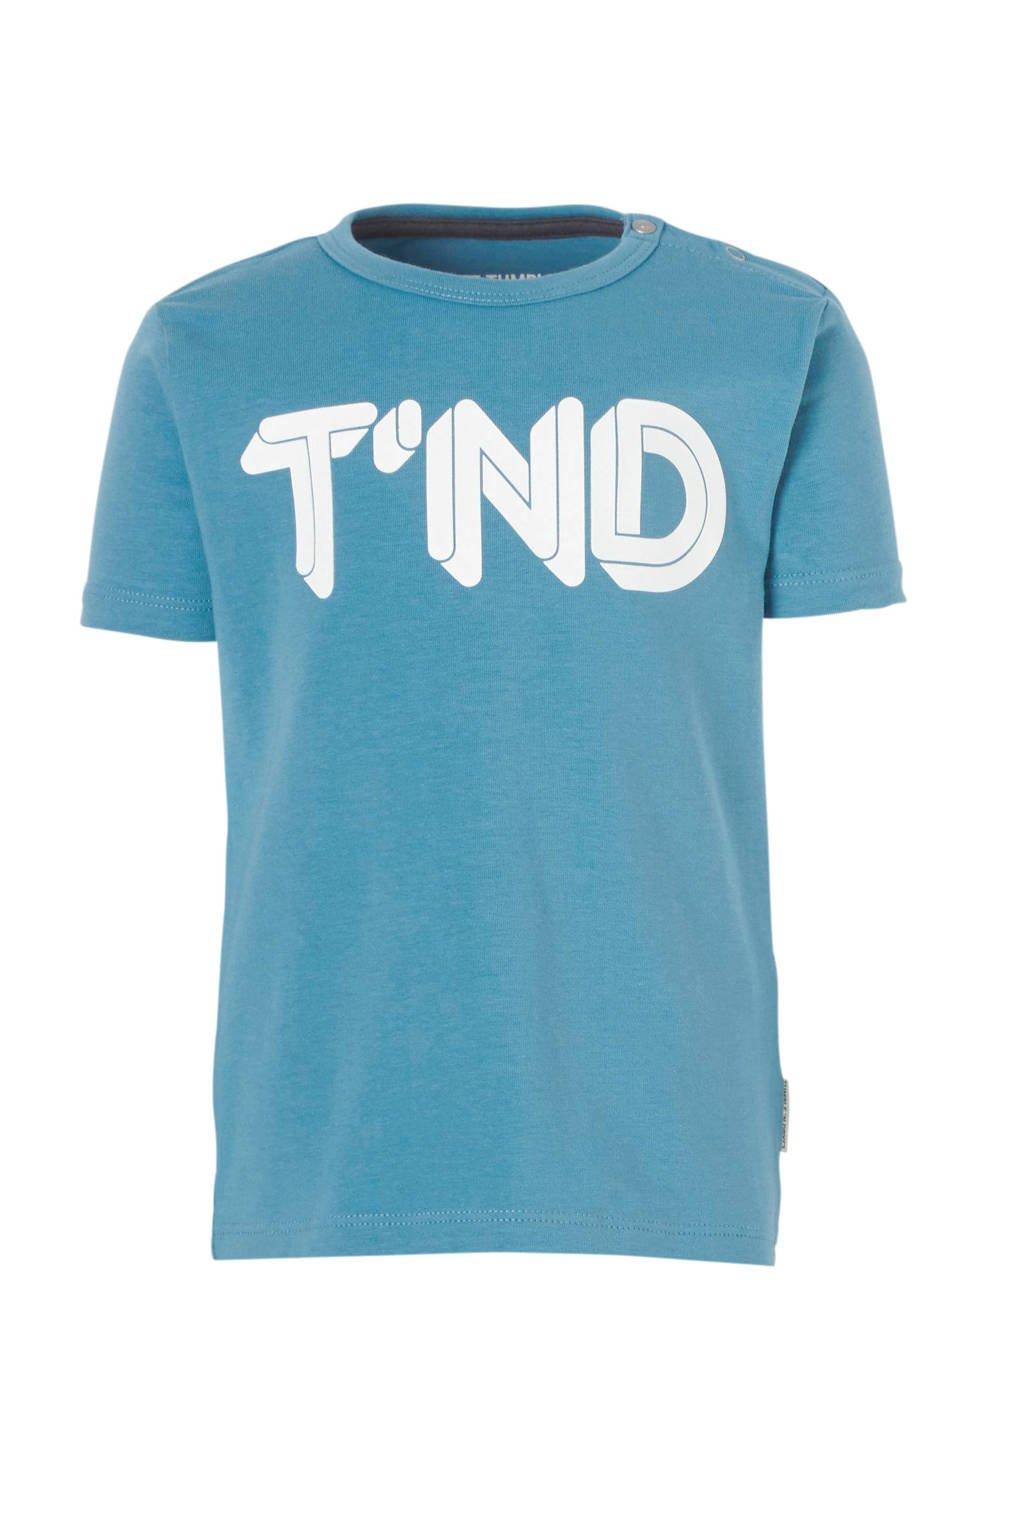 Tumble 'n Dry Lo baby T-shirt Aquapo met logo blauw, Blauw